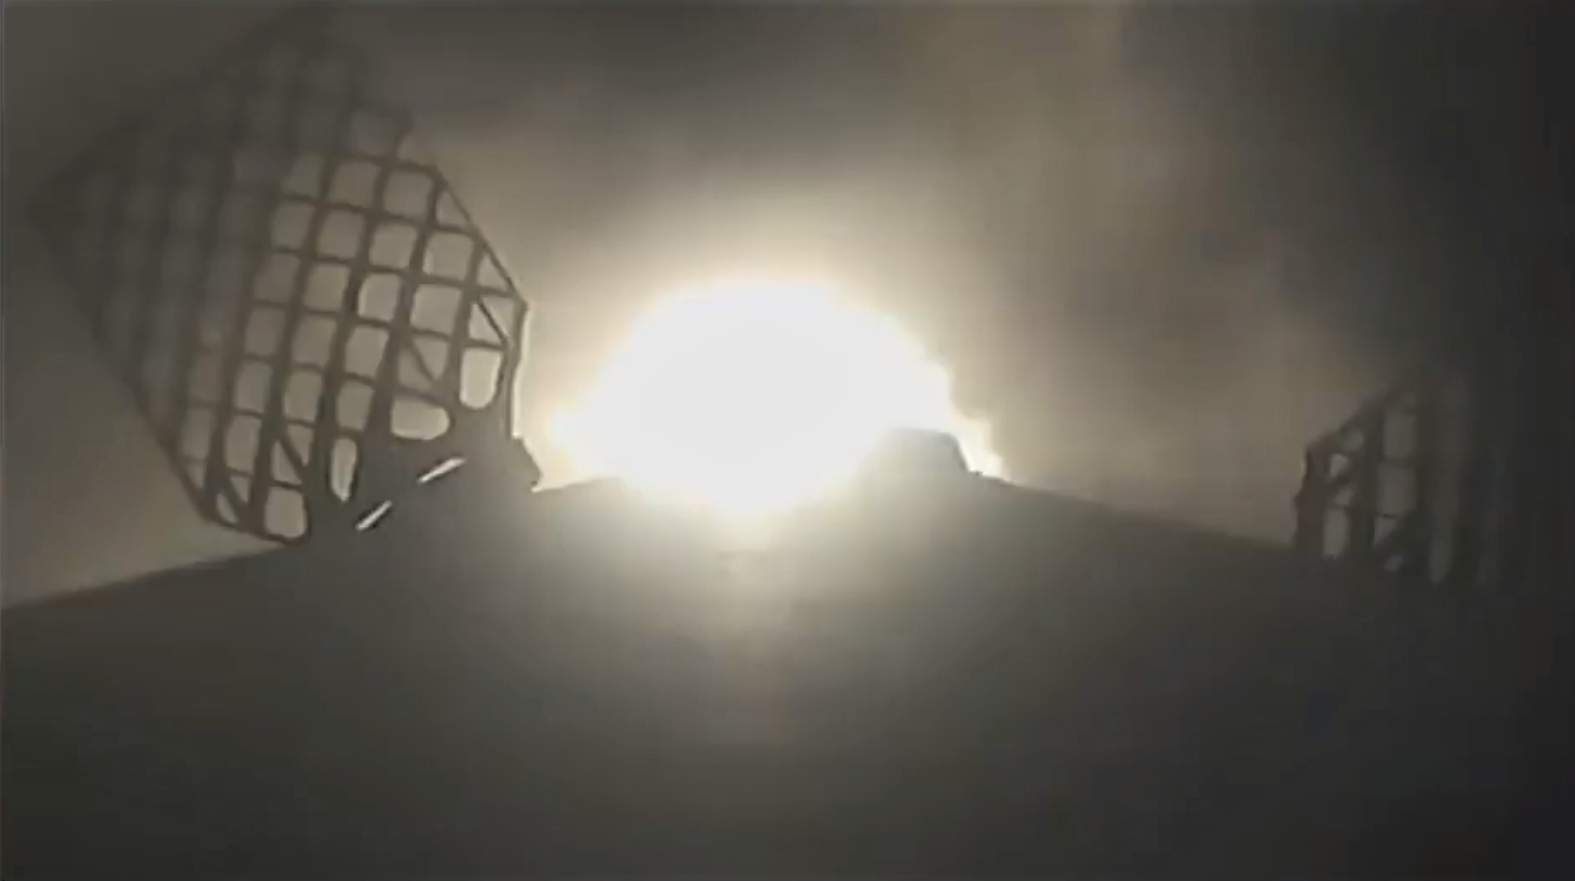 Falcon 9 B1049 reentry burn (SpaceX) 1